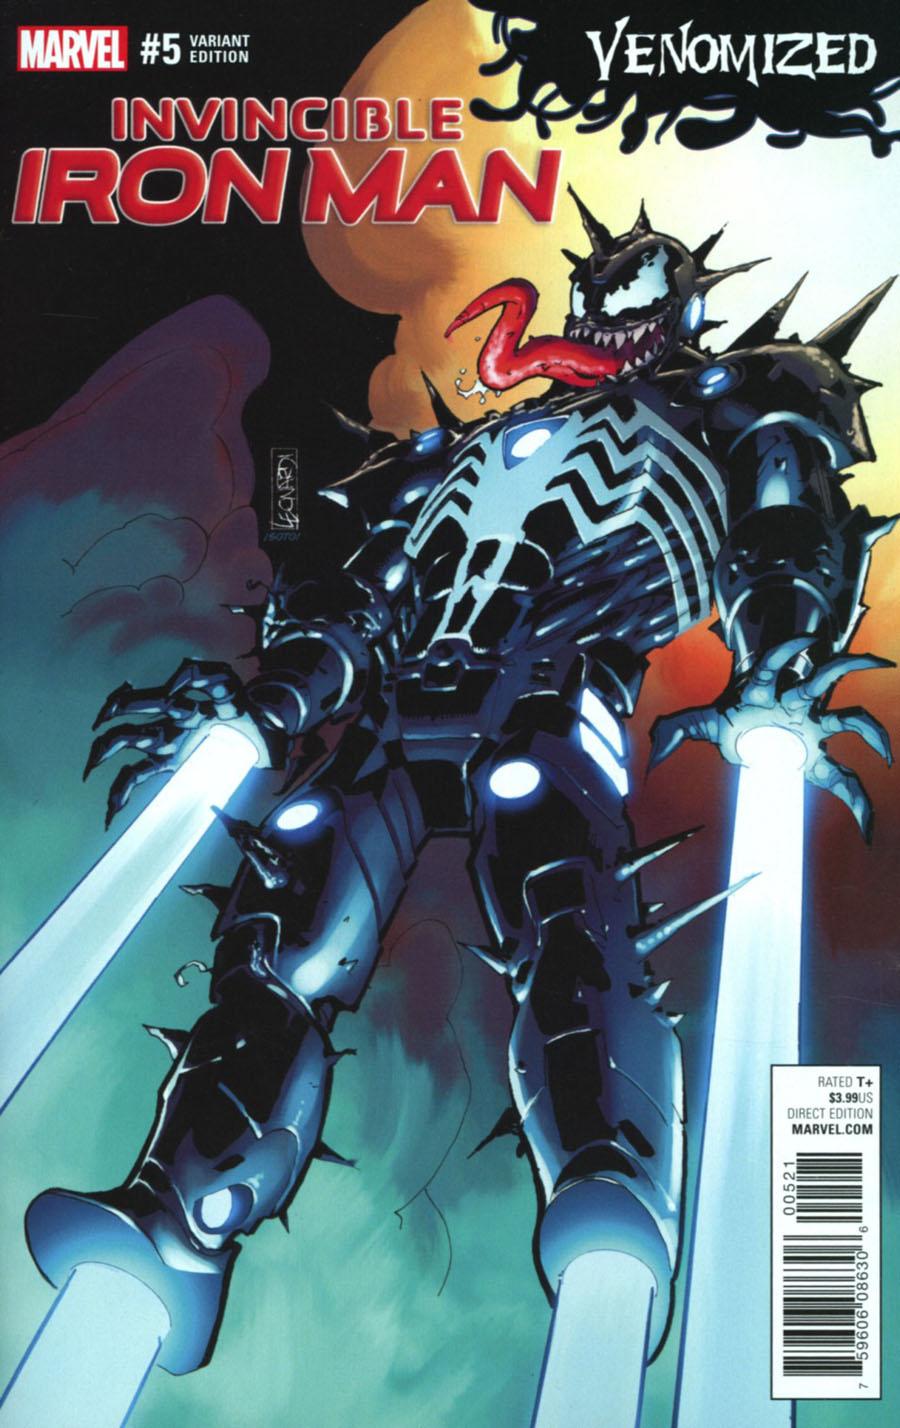 Invincible Iron Man Vol 3 #5 Cover B Variant Rick Leonardi Venomized Cover